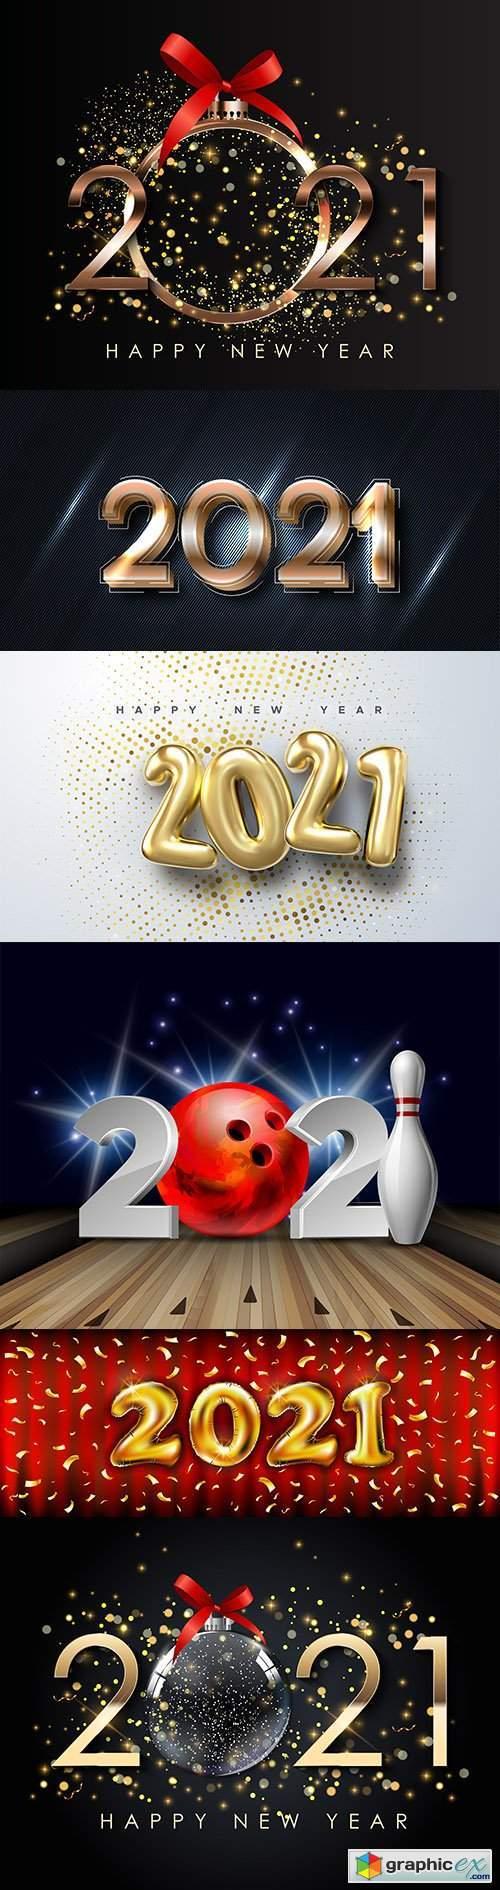 2021 New Year's illustrations Festive design inscription